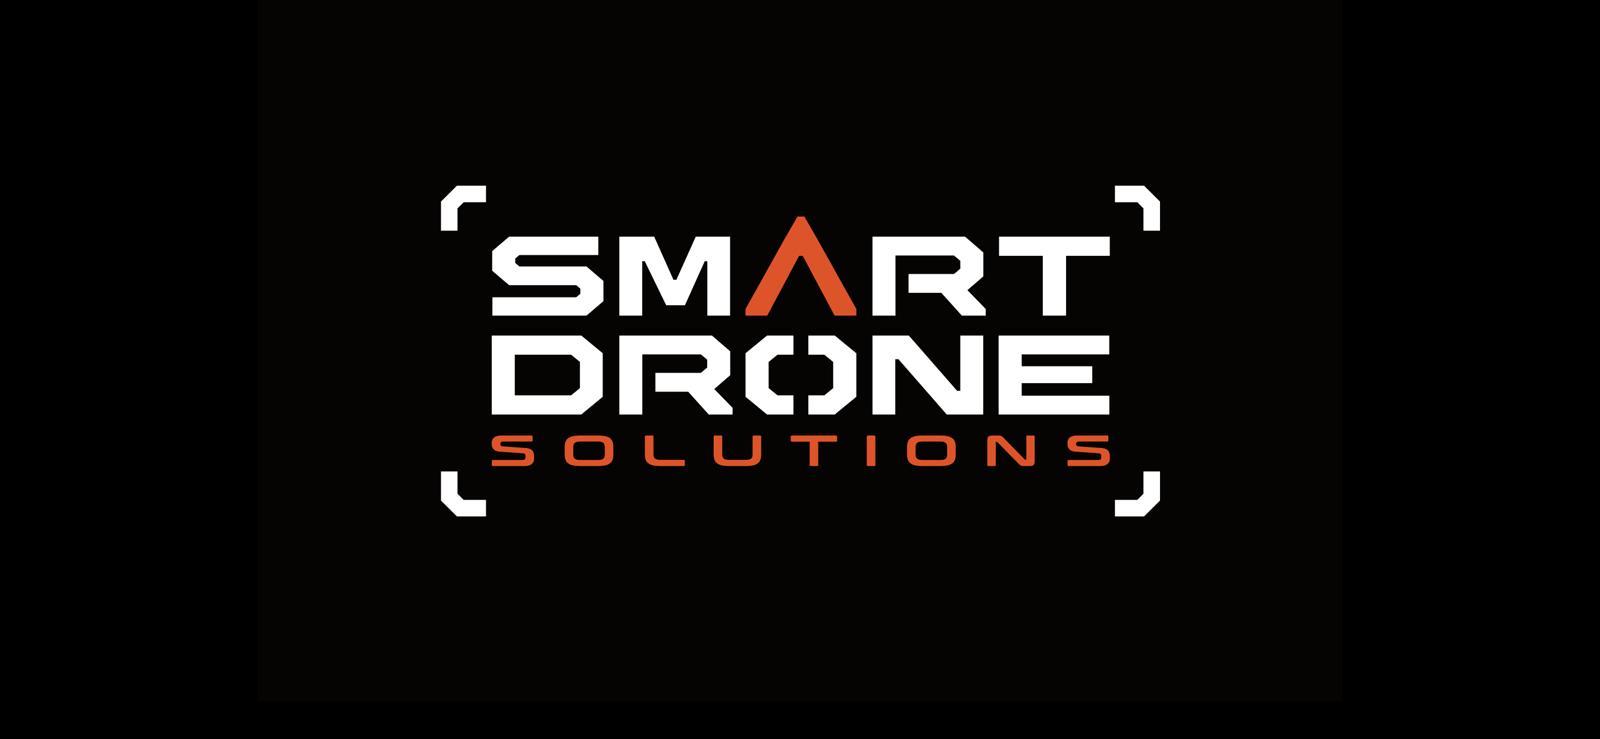 Smart Drone Solutions Ltd